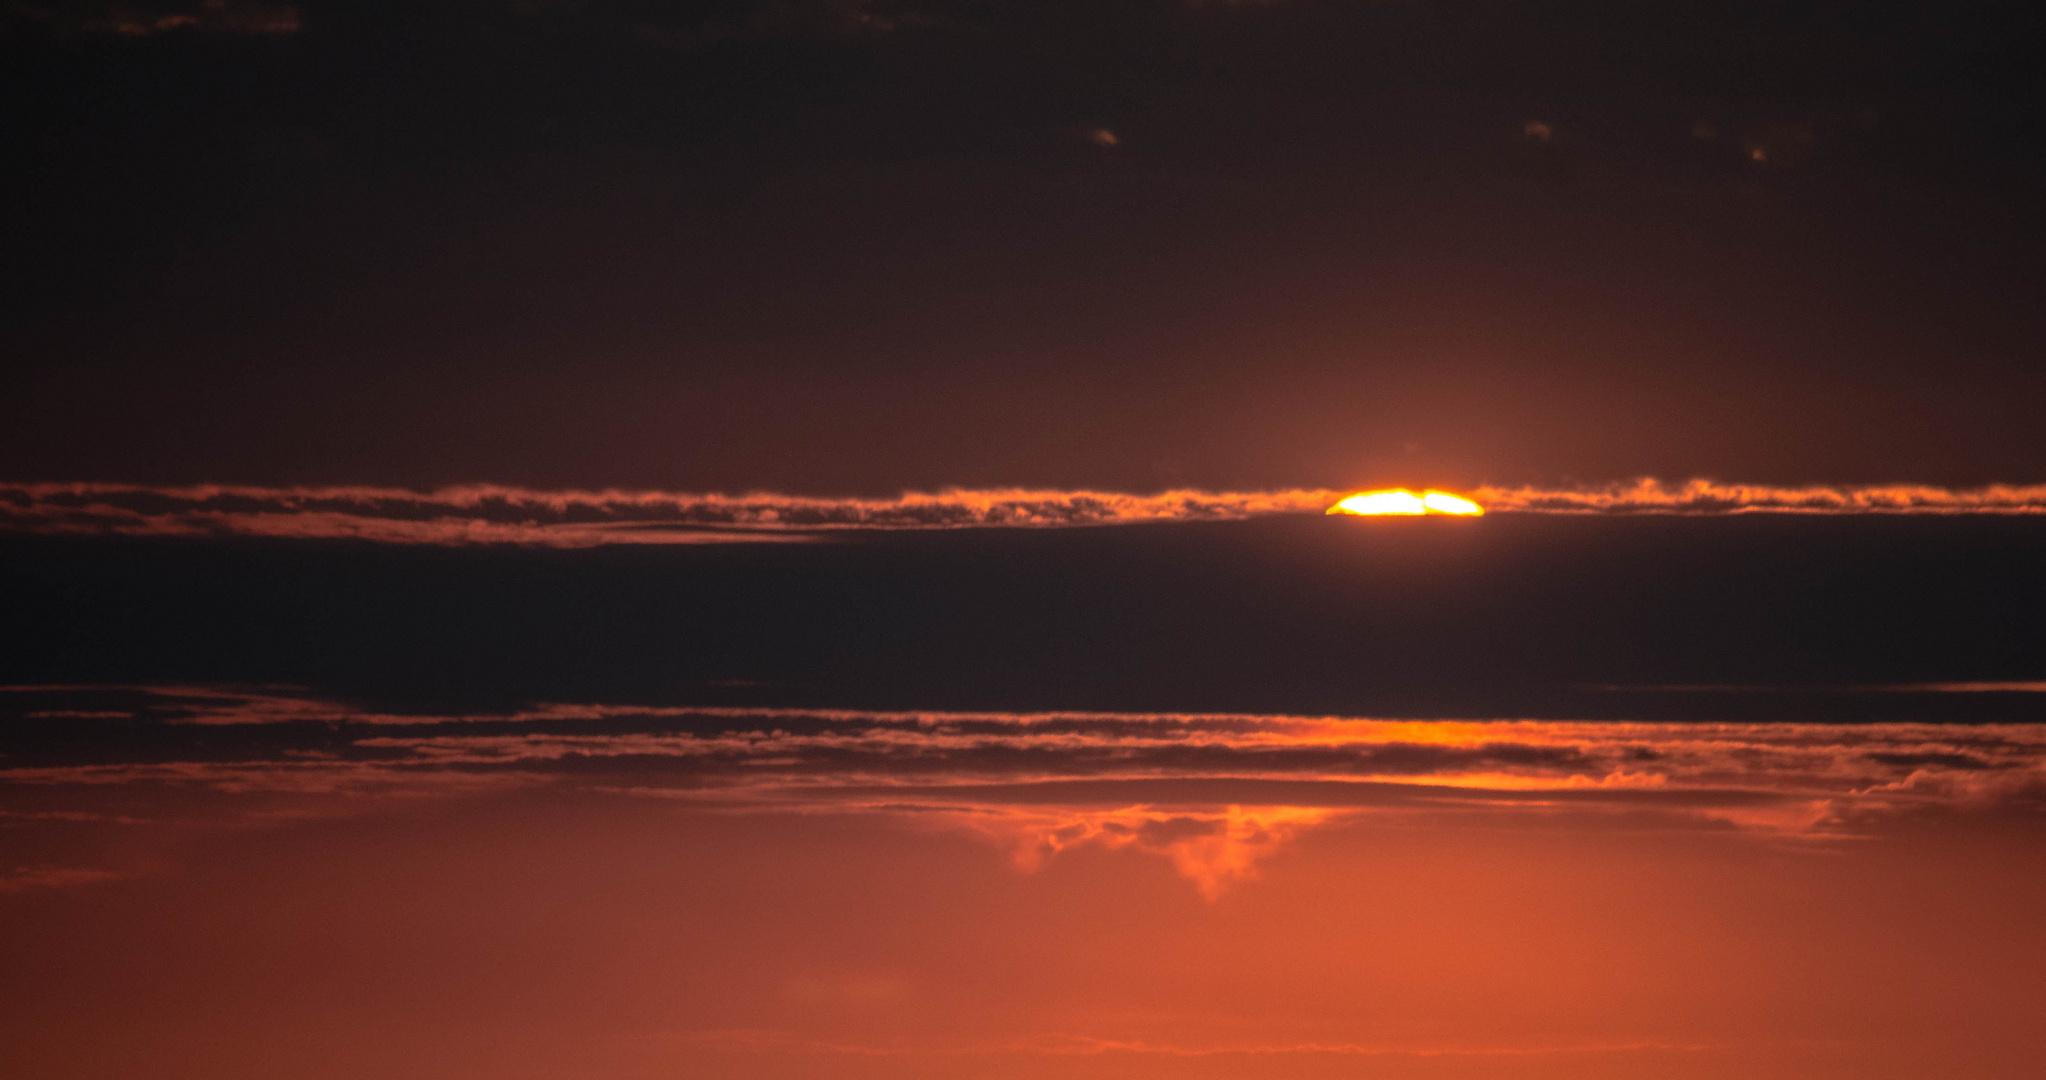 Sonnenaufgang aus dem Ballonkorb